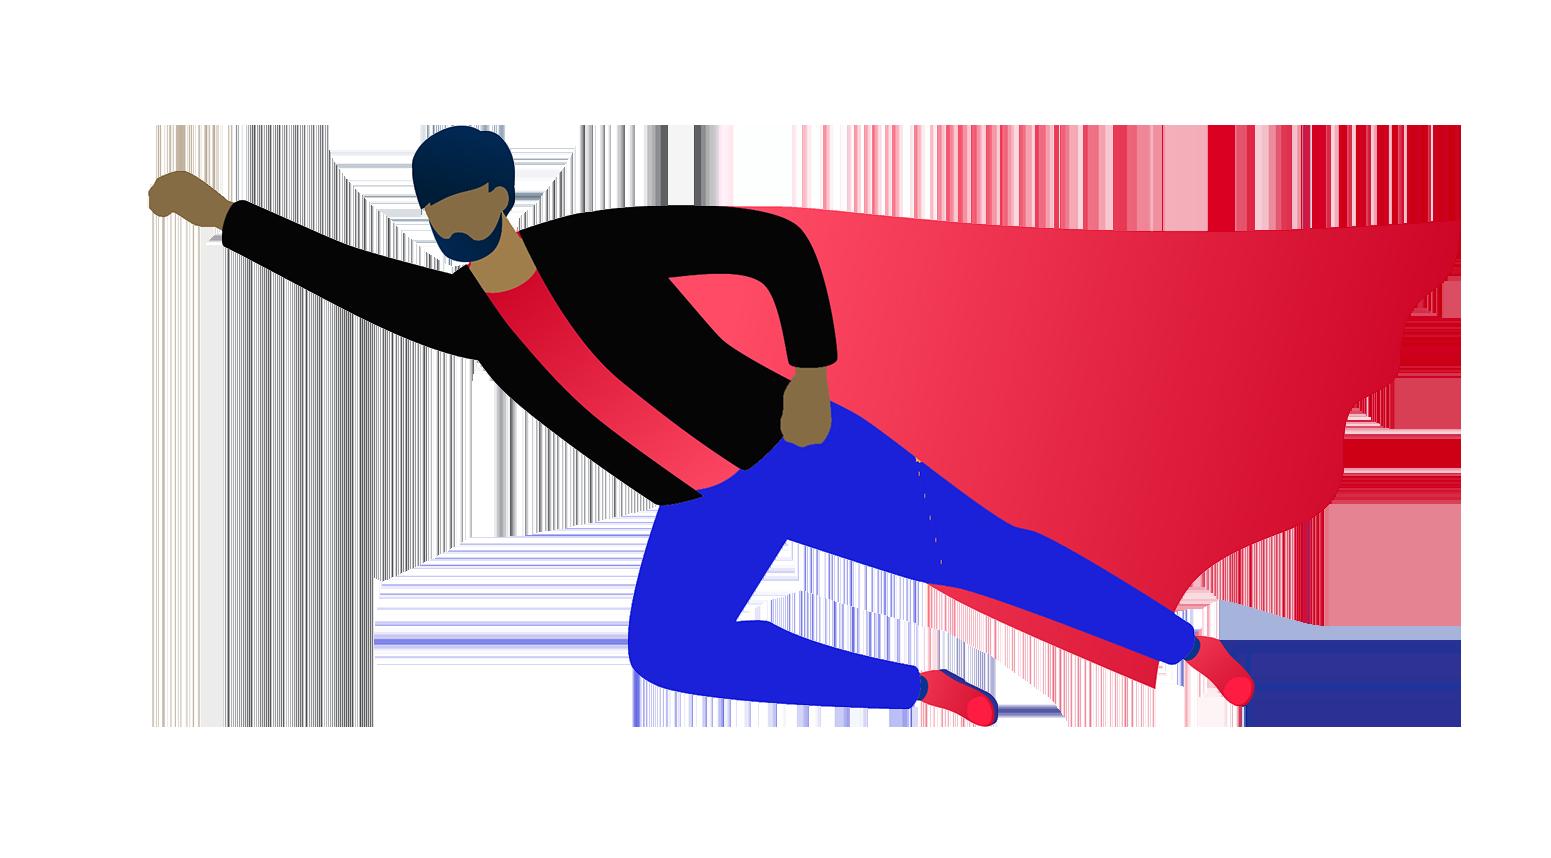 https://careernet.com/wp-content/uploads/2021/06/super-hero.png